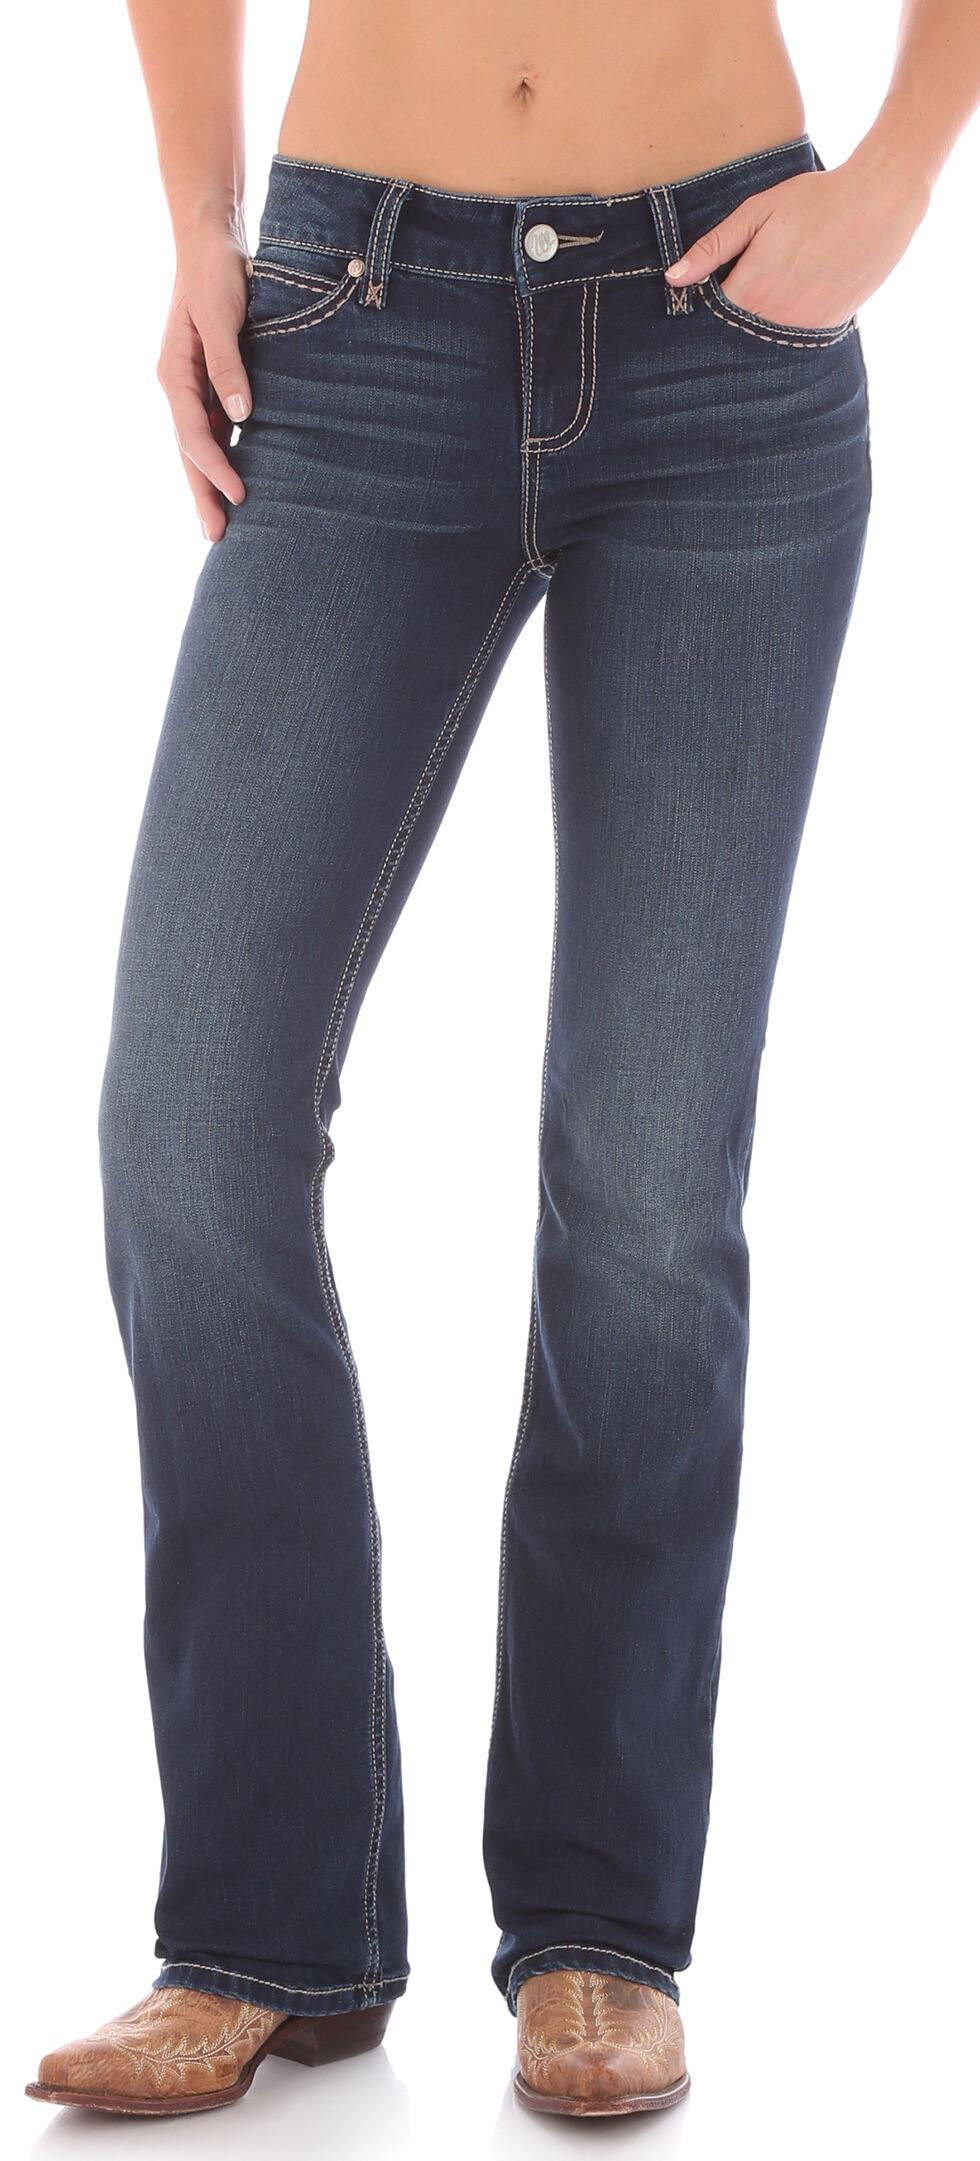 Wrangler Women's Dark Wash Retro Mae Jeans , Indigo, hi-res